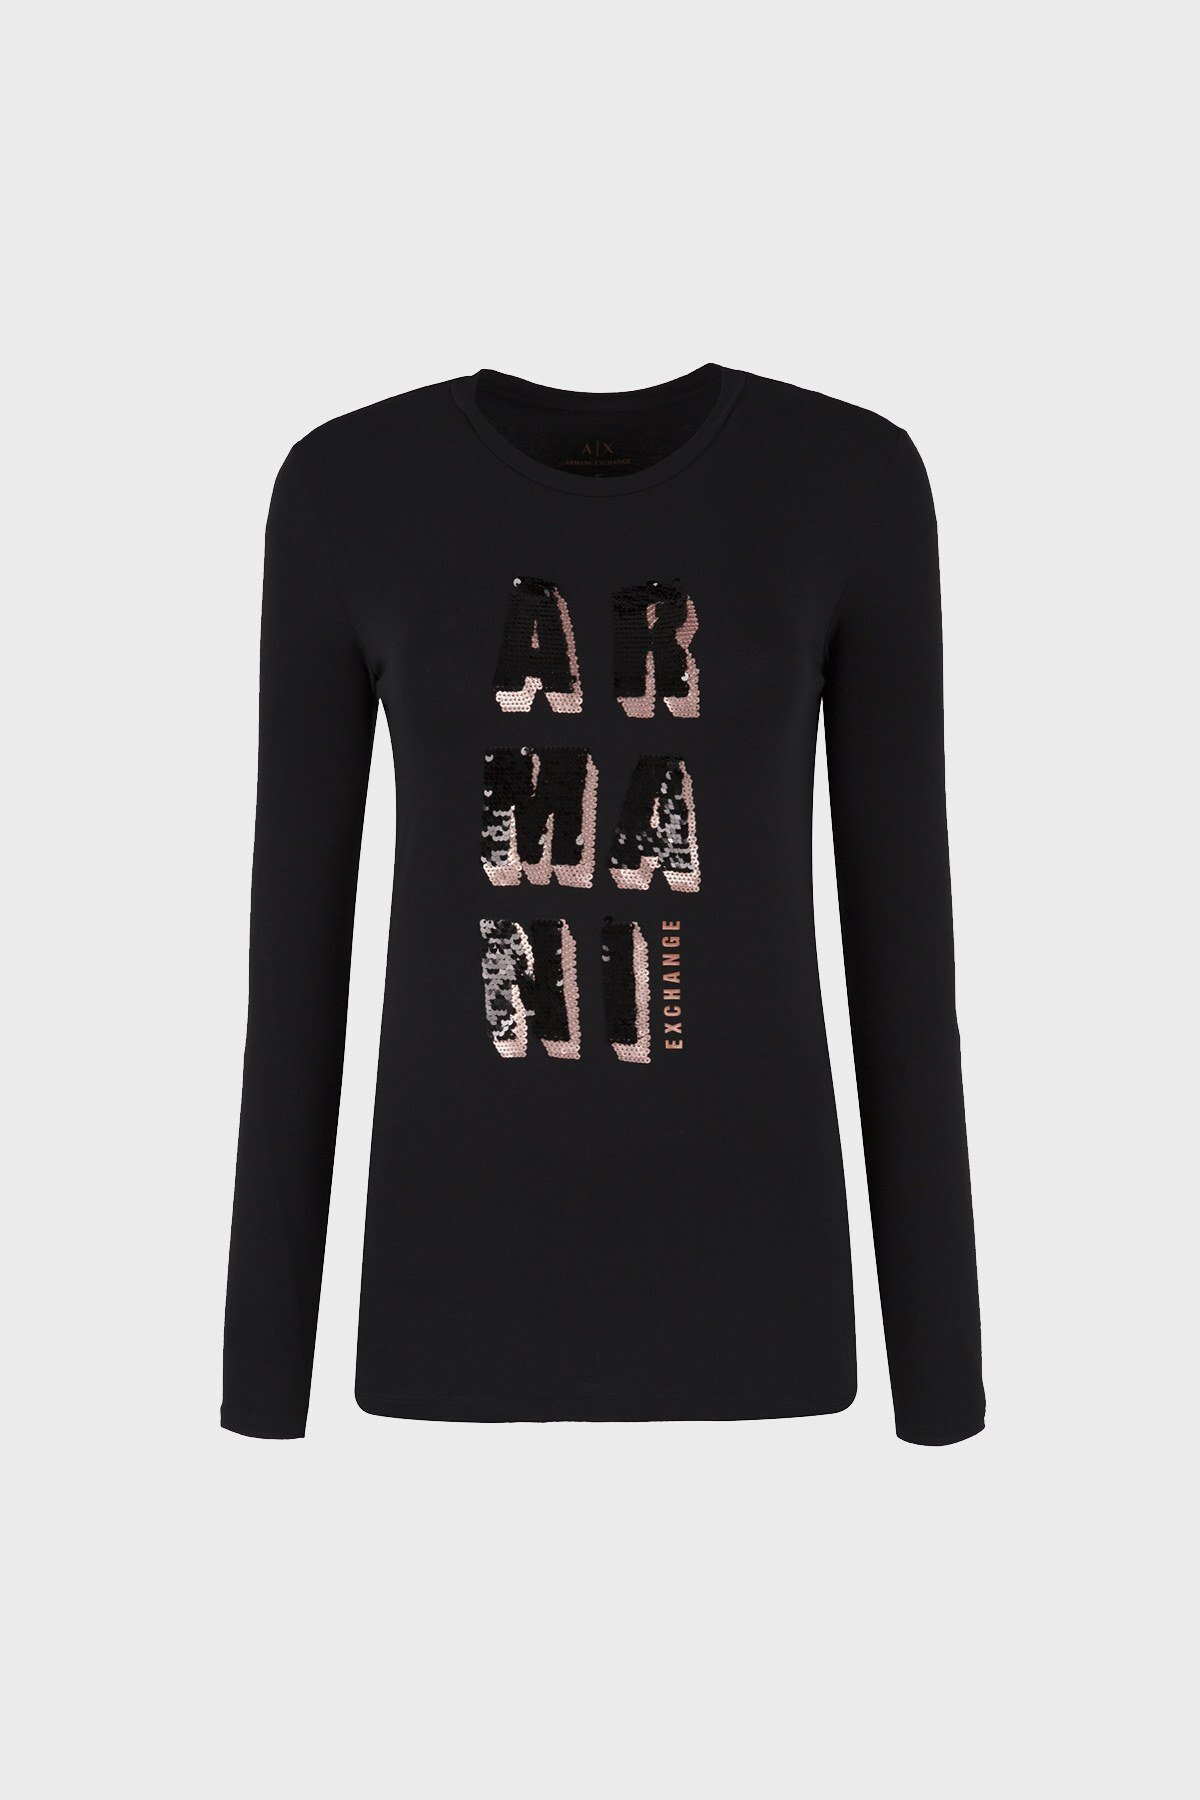 ARMANI EXCHANGE T SHIRT Bayan T Shirt 6ZYTAU YJC7Z 1200 SİYAH